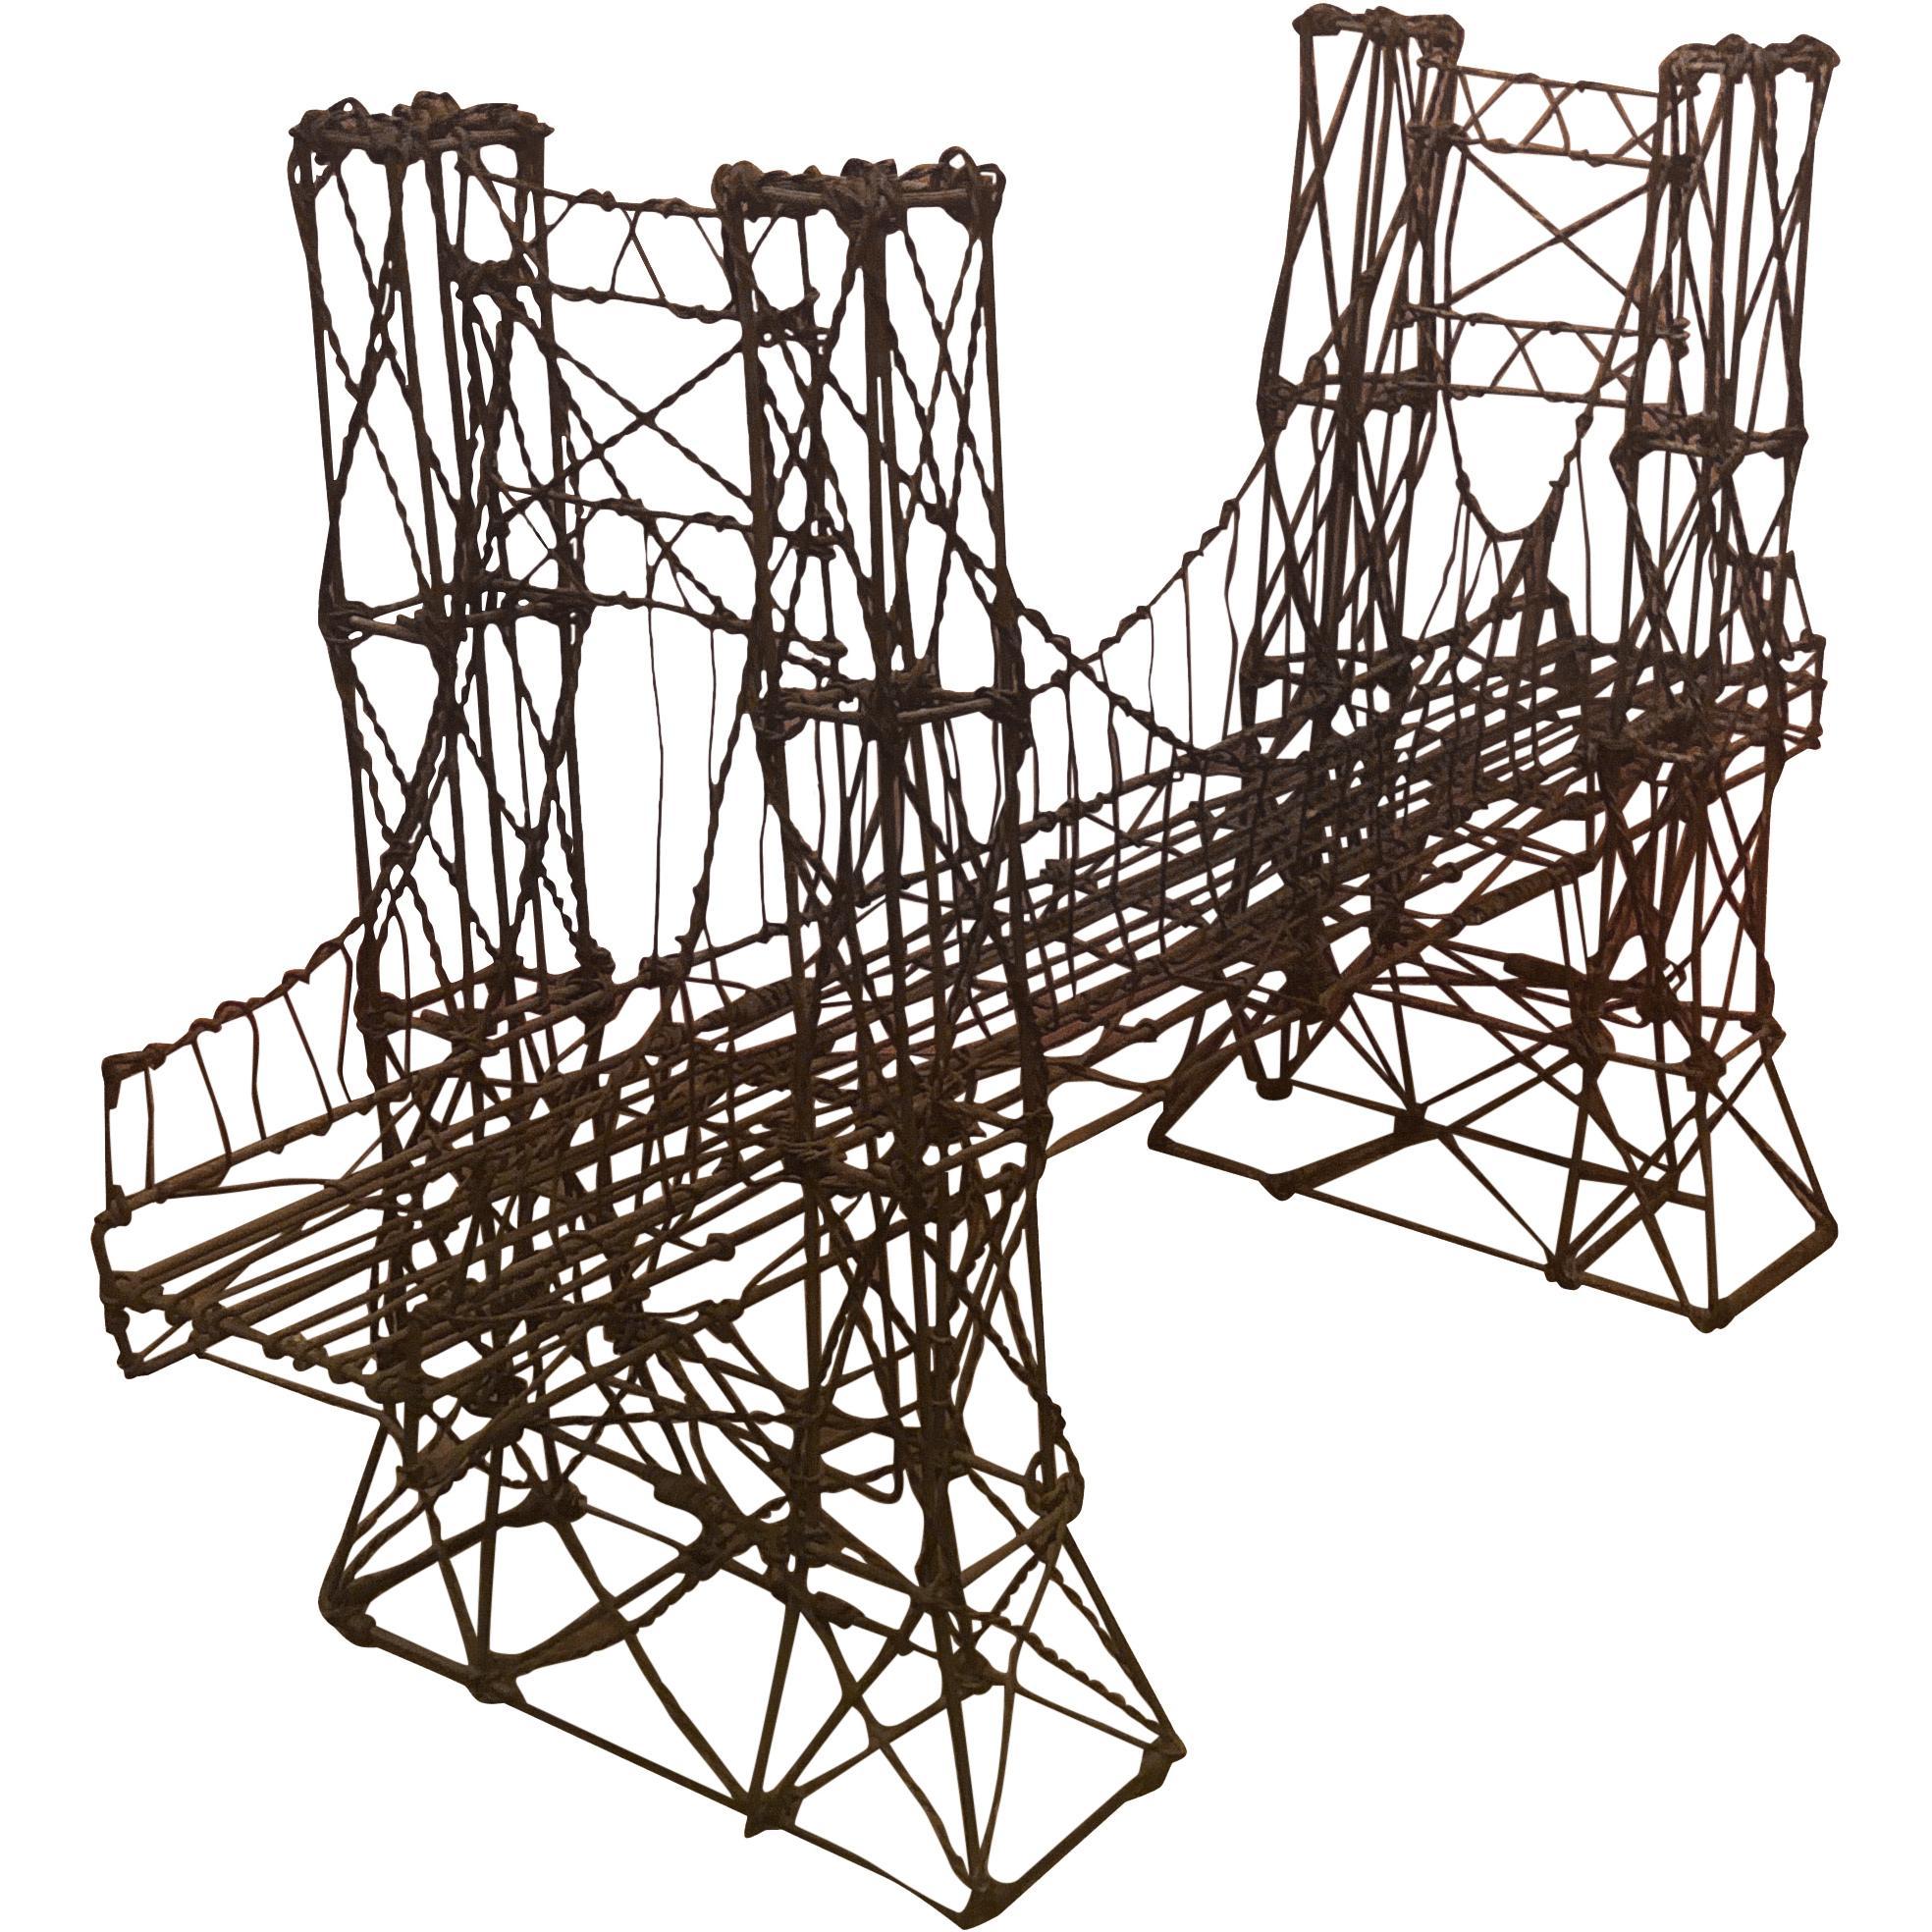 Brooklyn Bridge Brutalist Metal Wire Sculpture